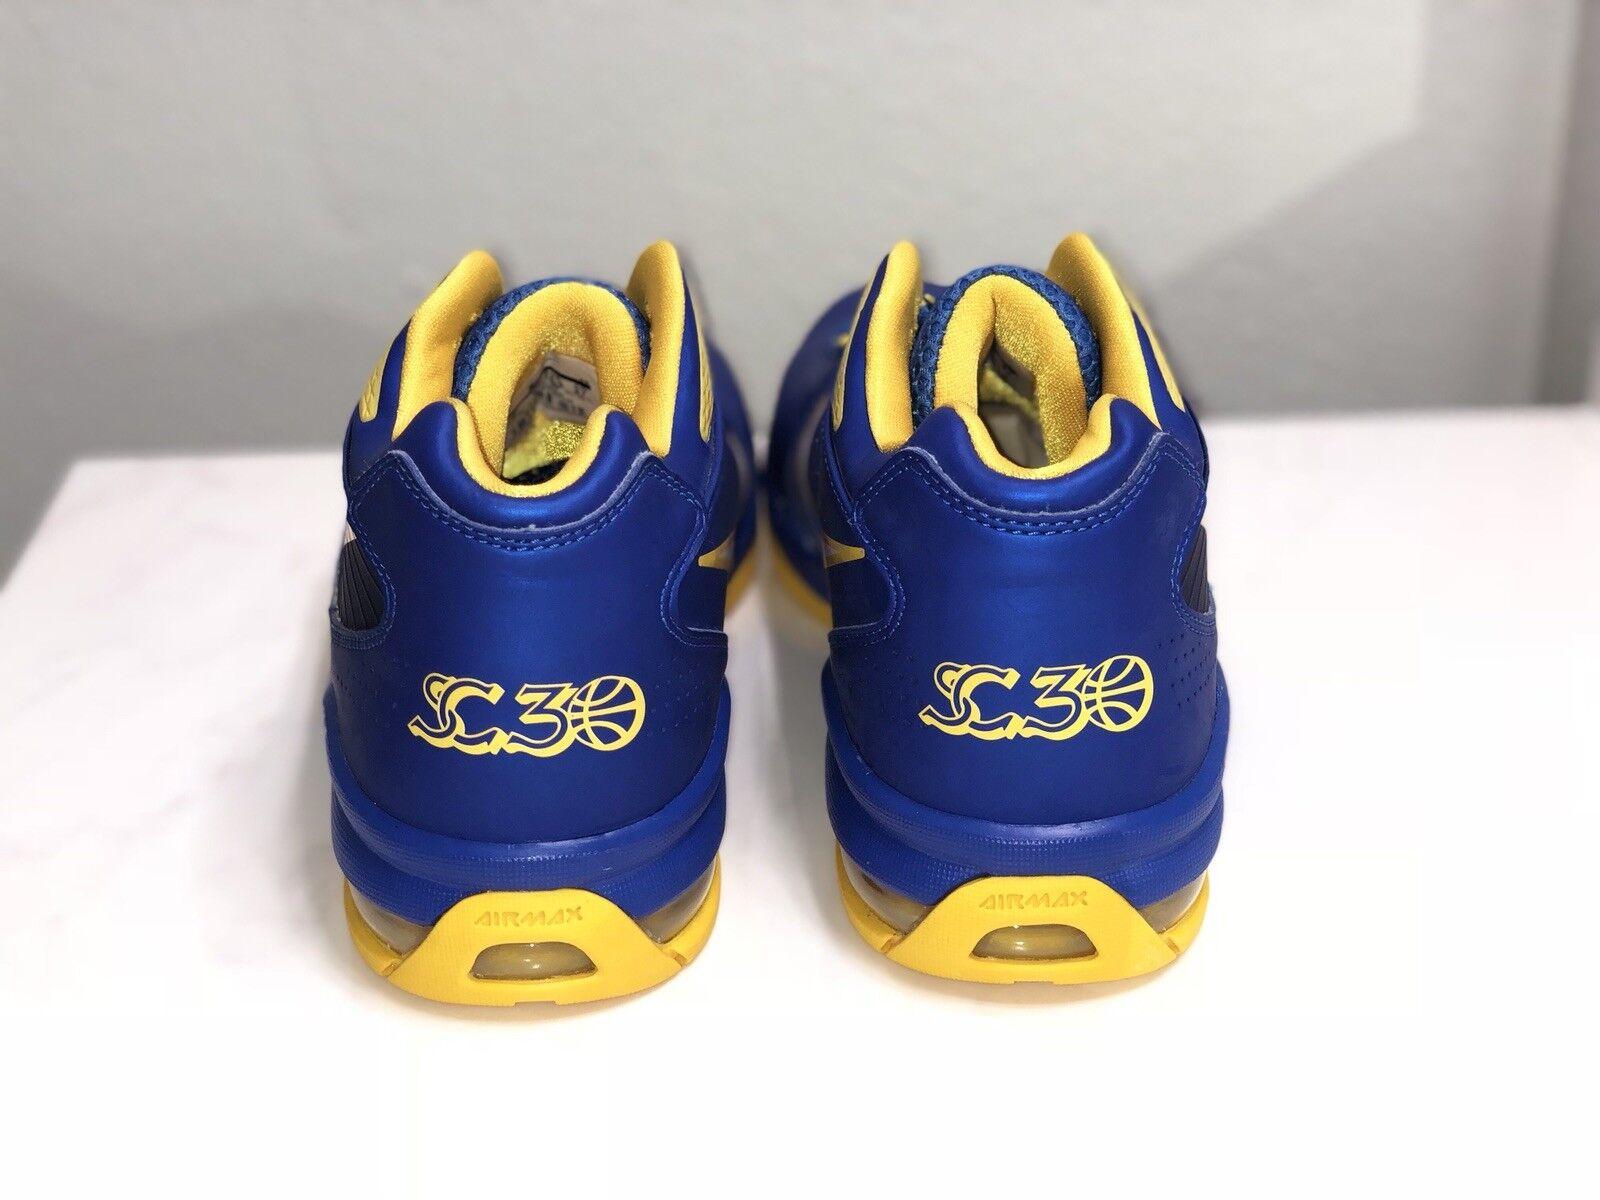 Nike Air Max Flight 11 Steph Curry PE sz sz sz 9 Rare Limited Warriors golden State 106183